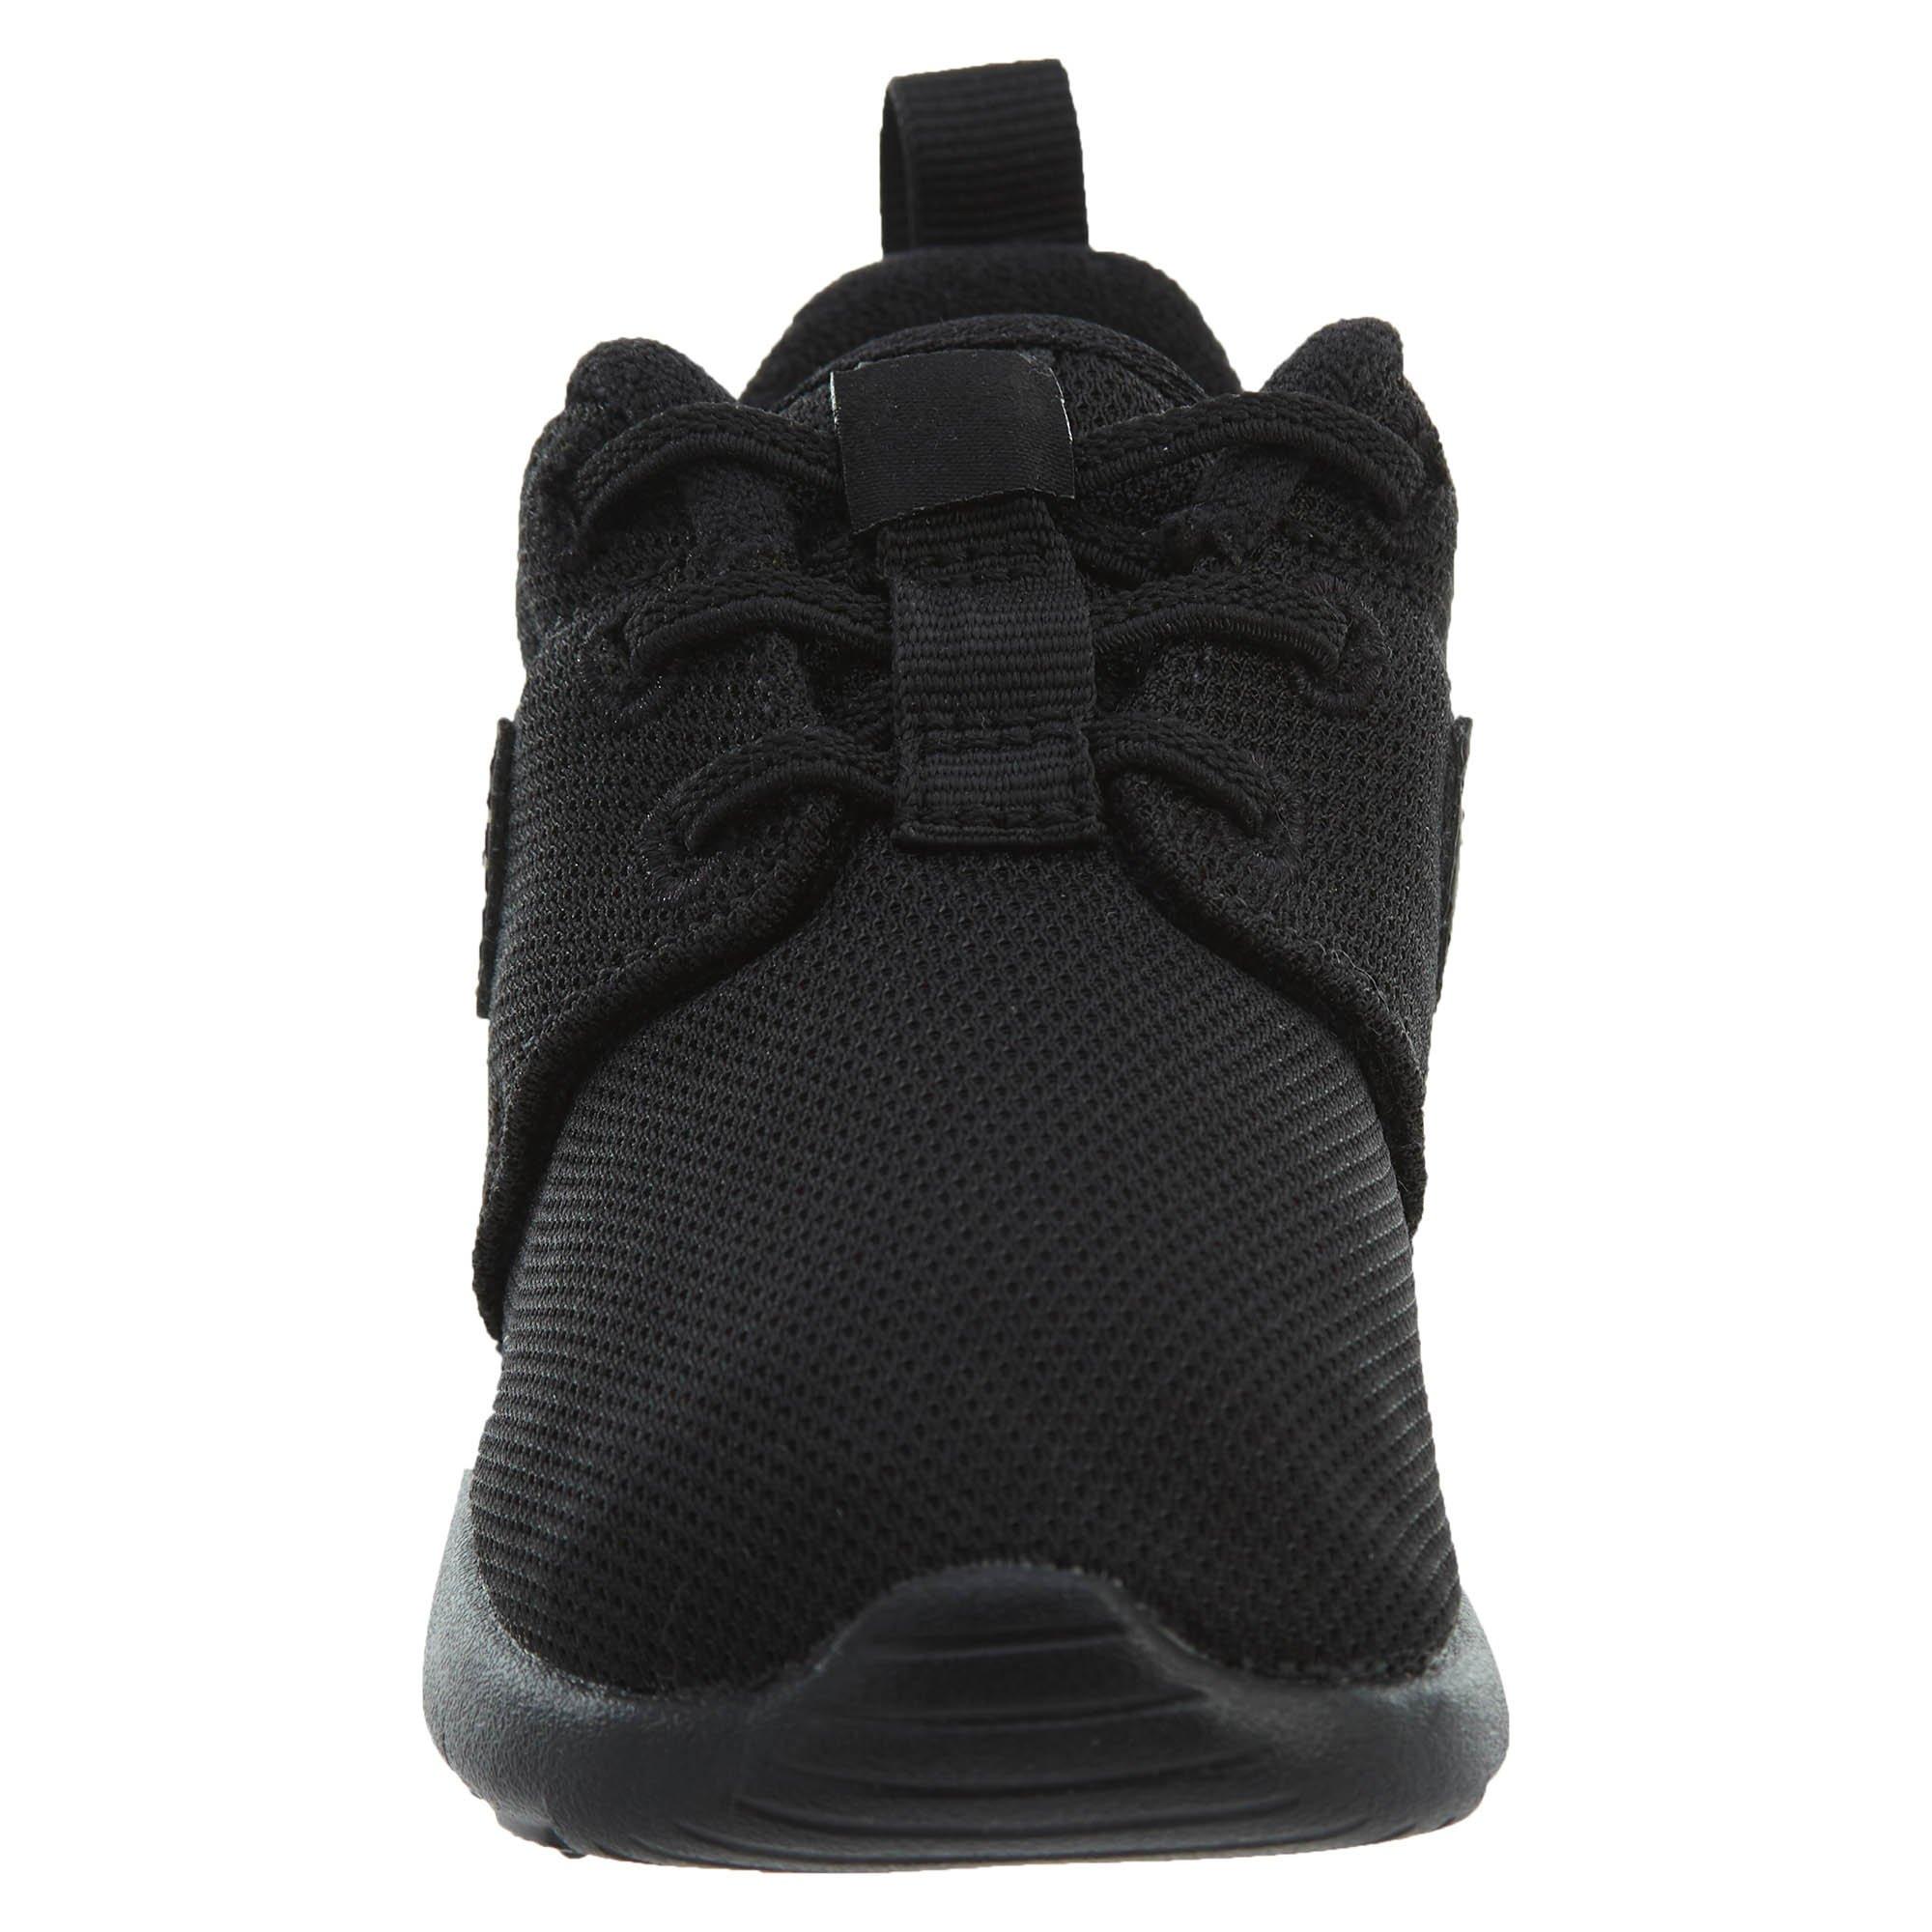 Nike Toddlers' Roshe One (TDV) Black Fabric Running Shoe 6 by Nike (Image #5)